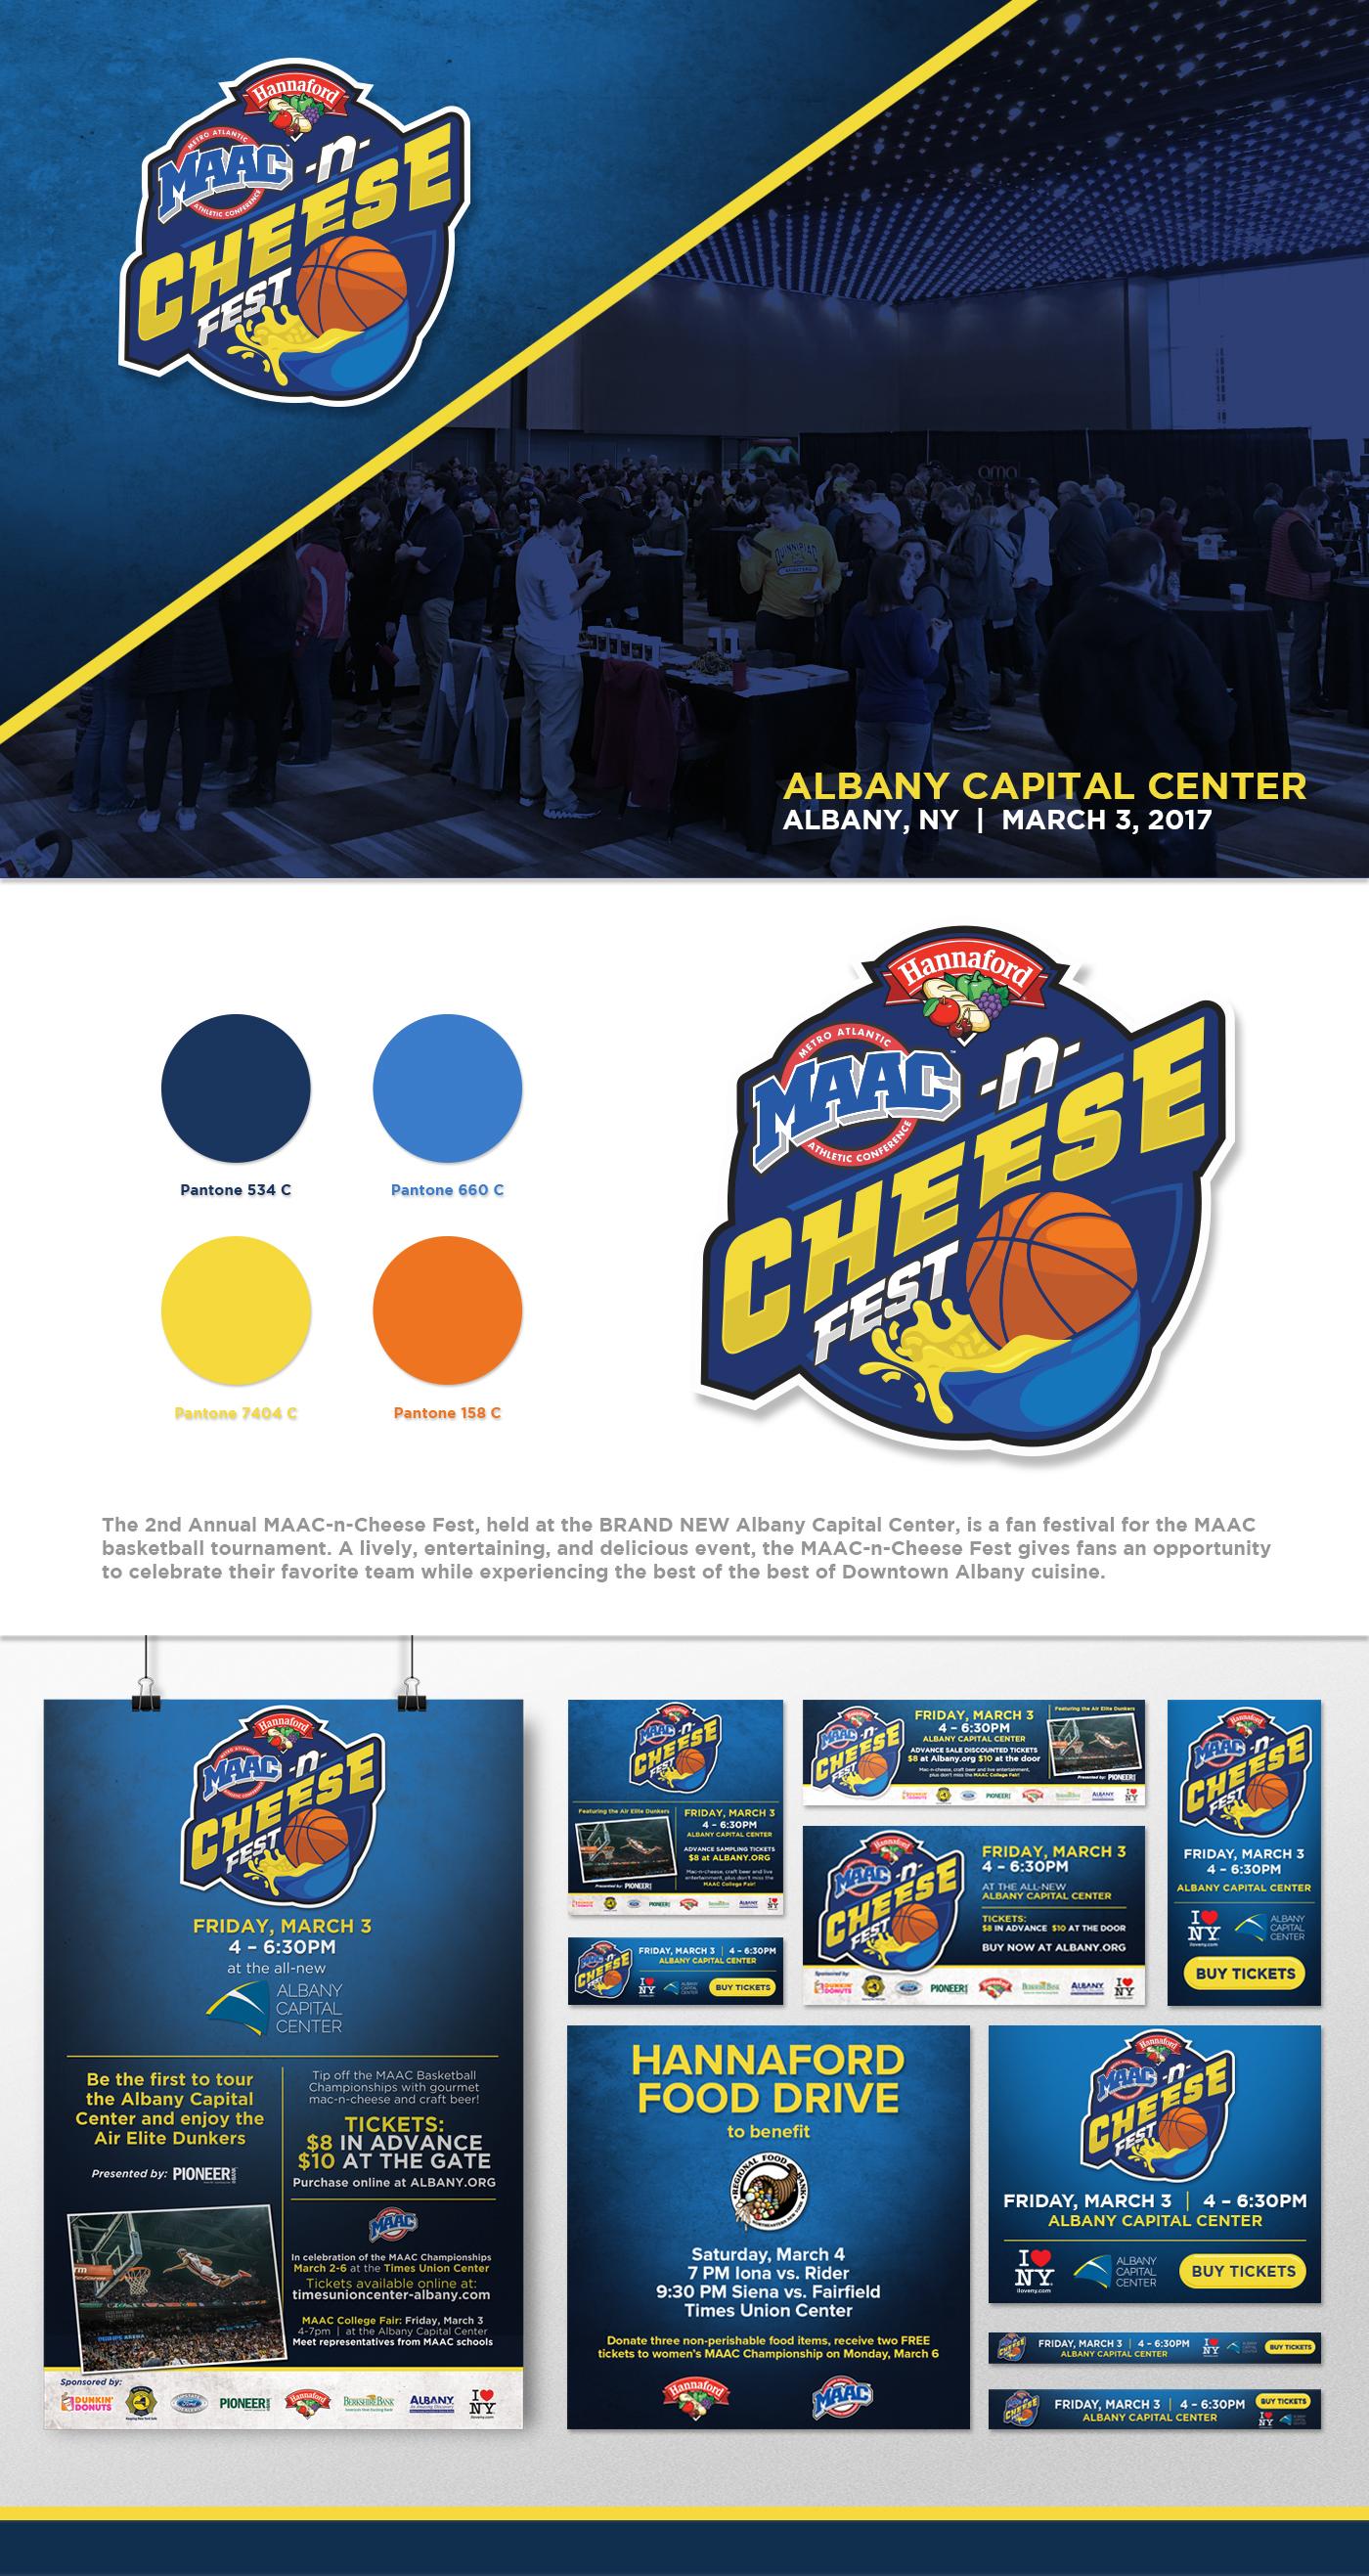 basketball,MAAC,Mac and Cheese,macaroni,Cheese,sports,fan festival